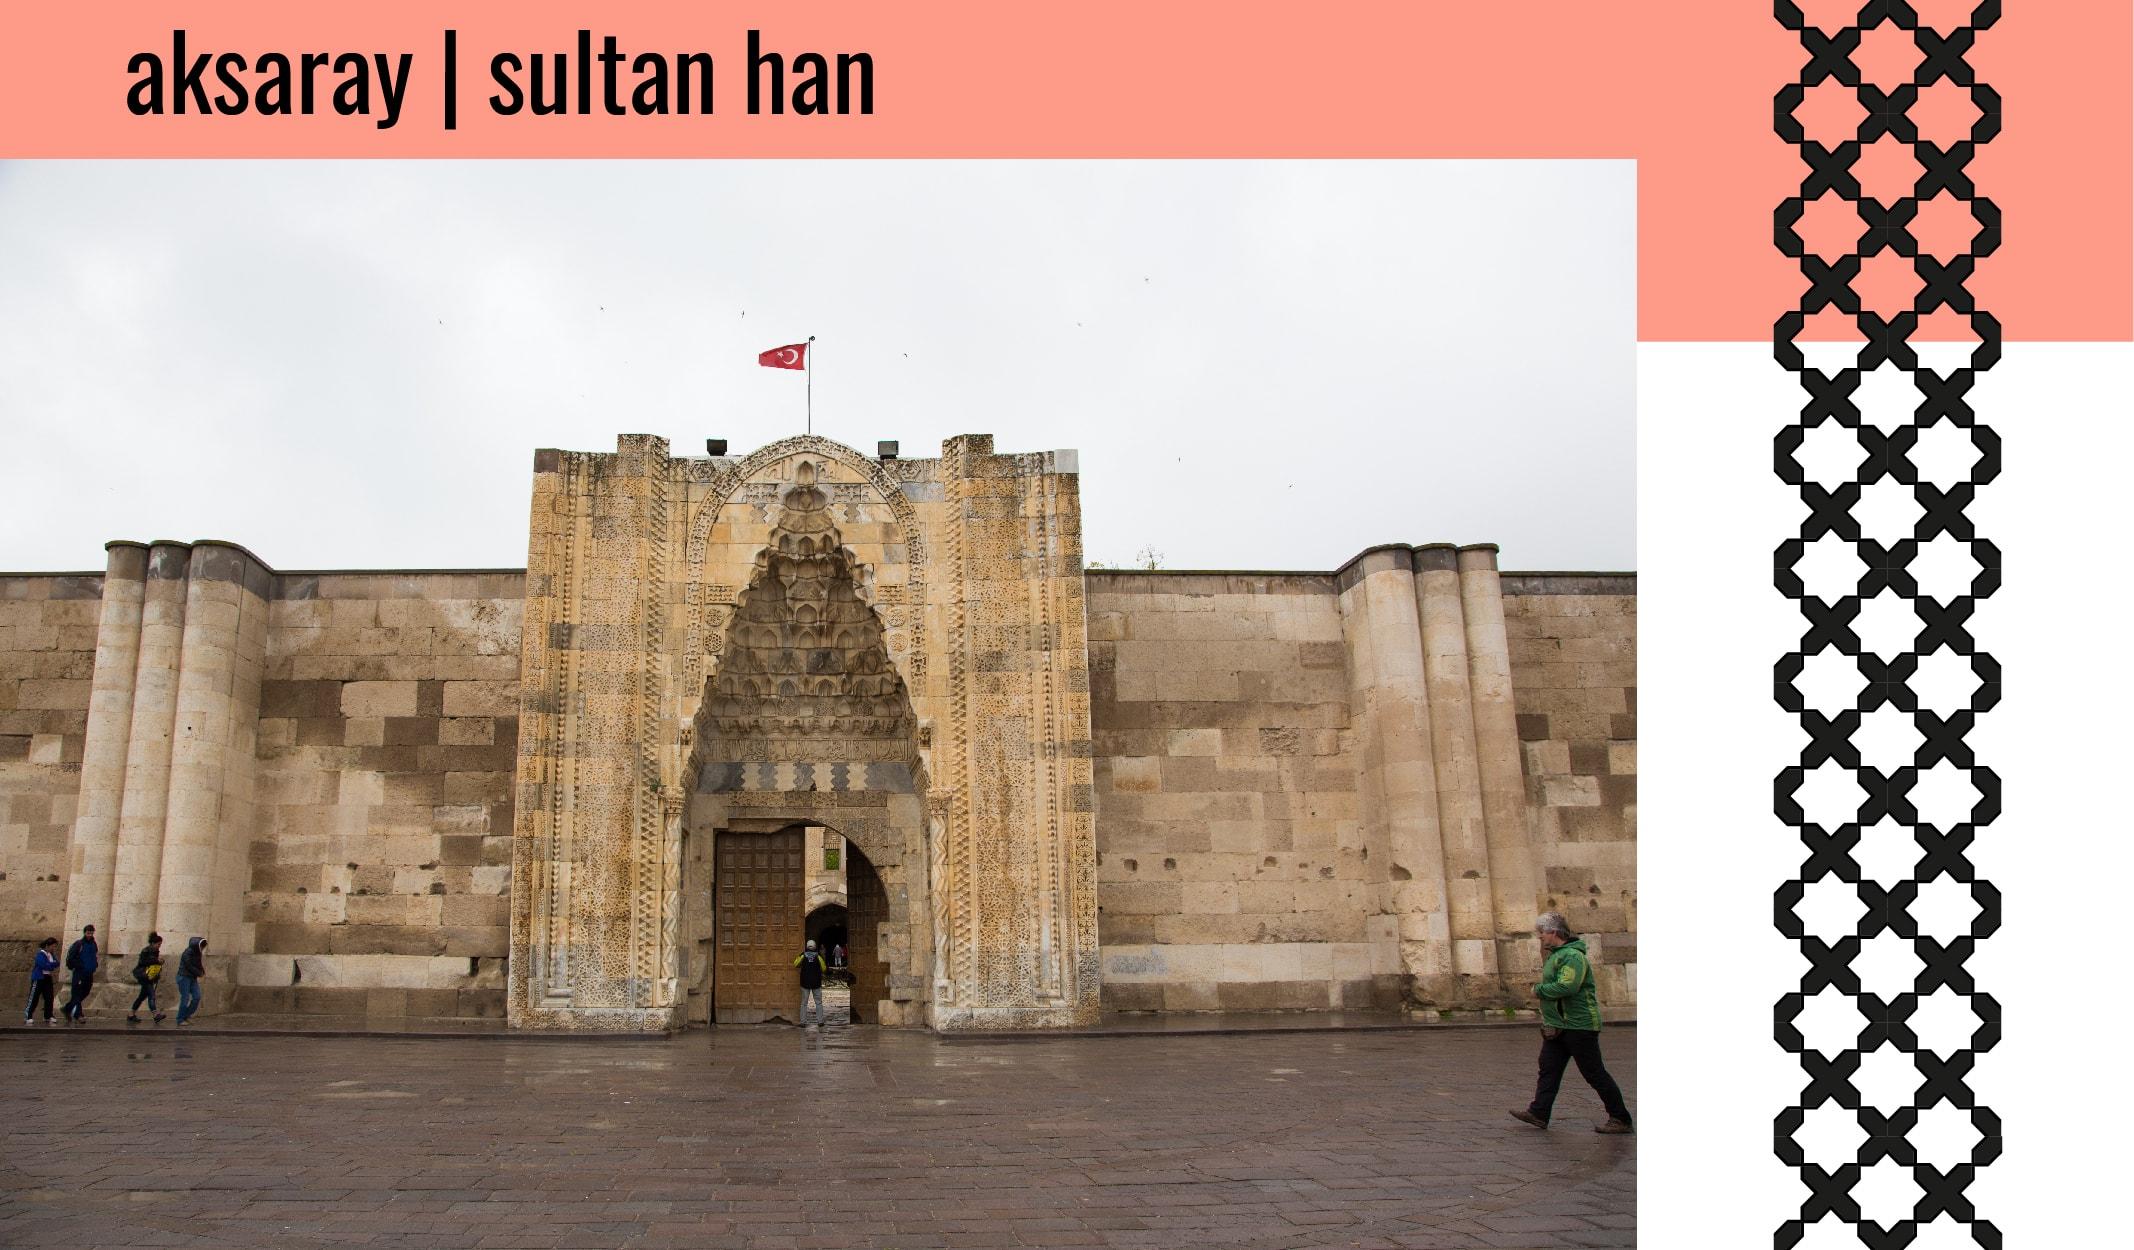 aksaray sultan han